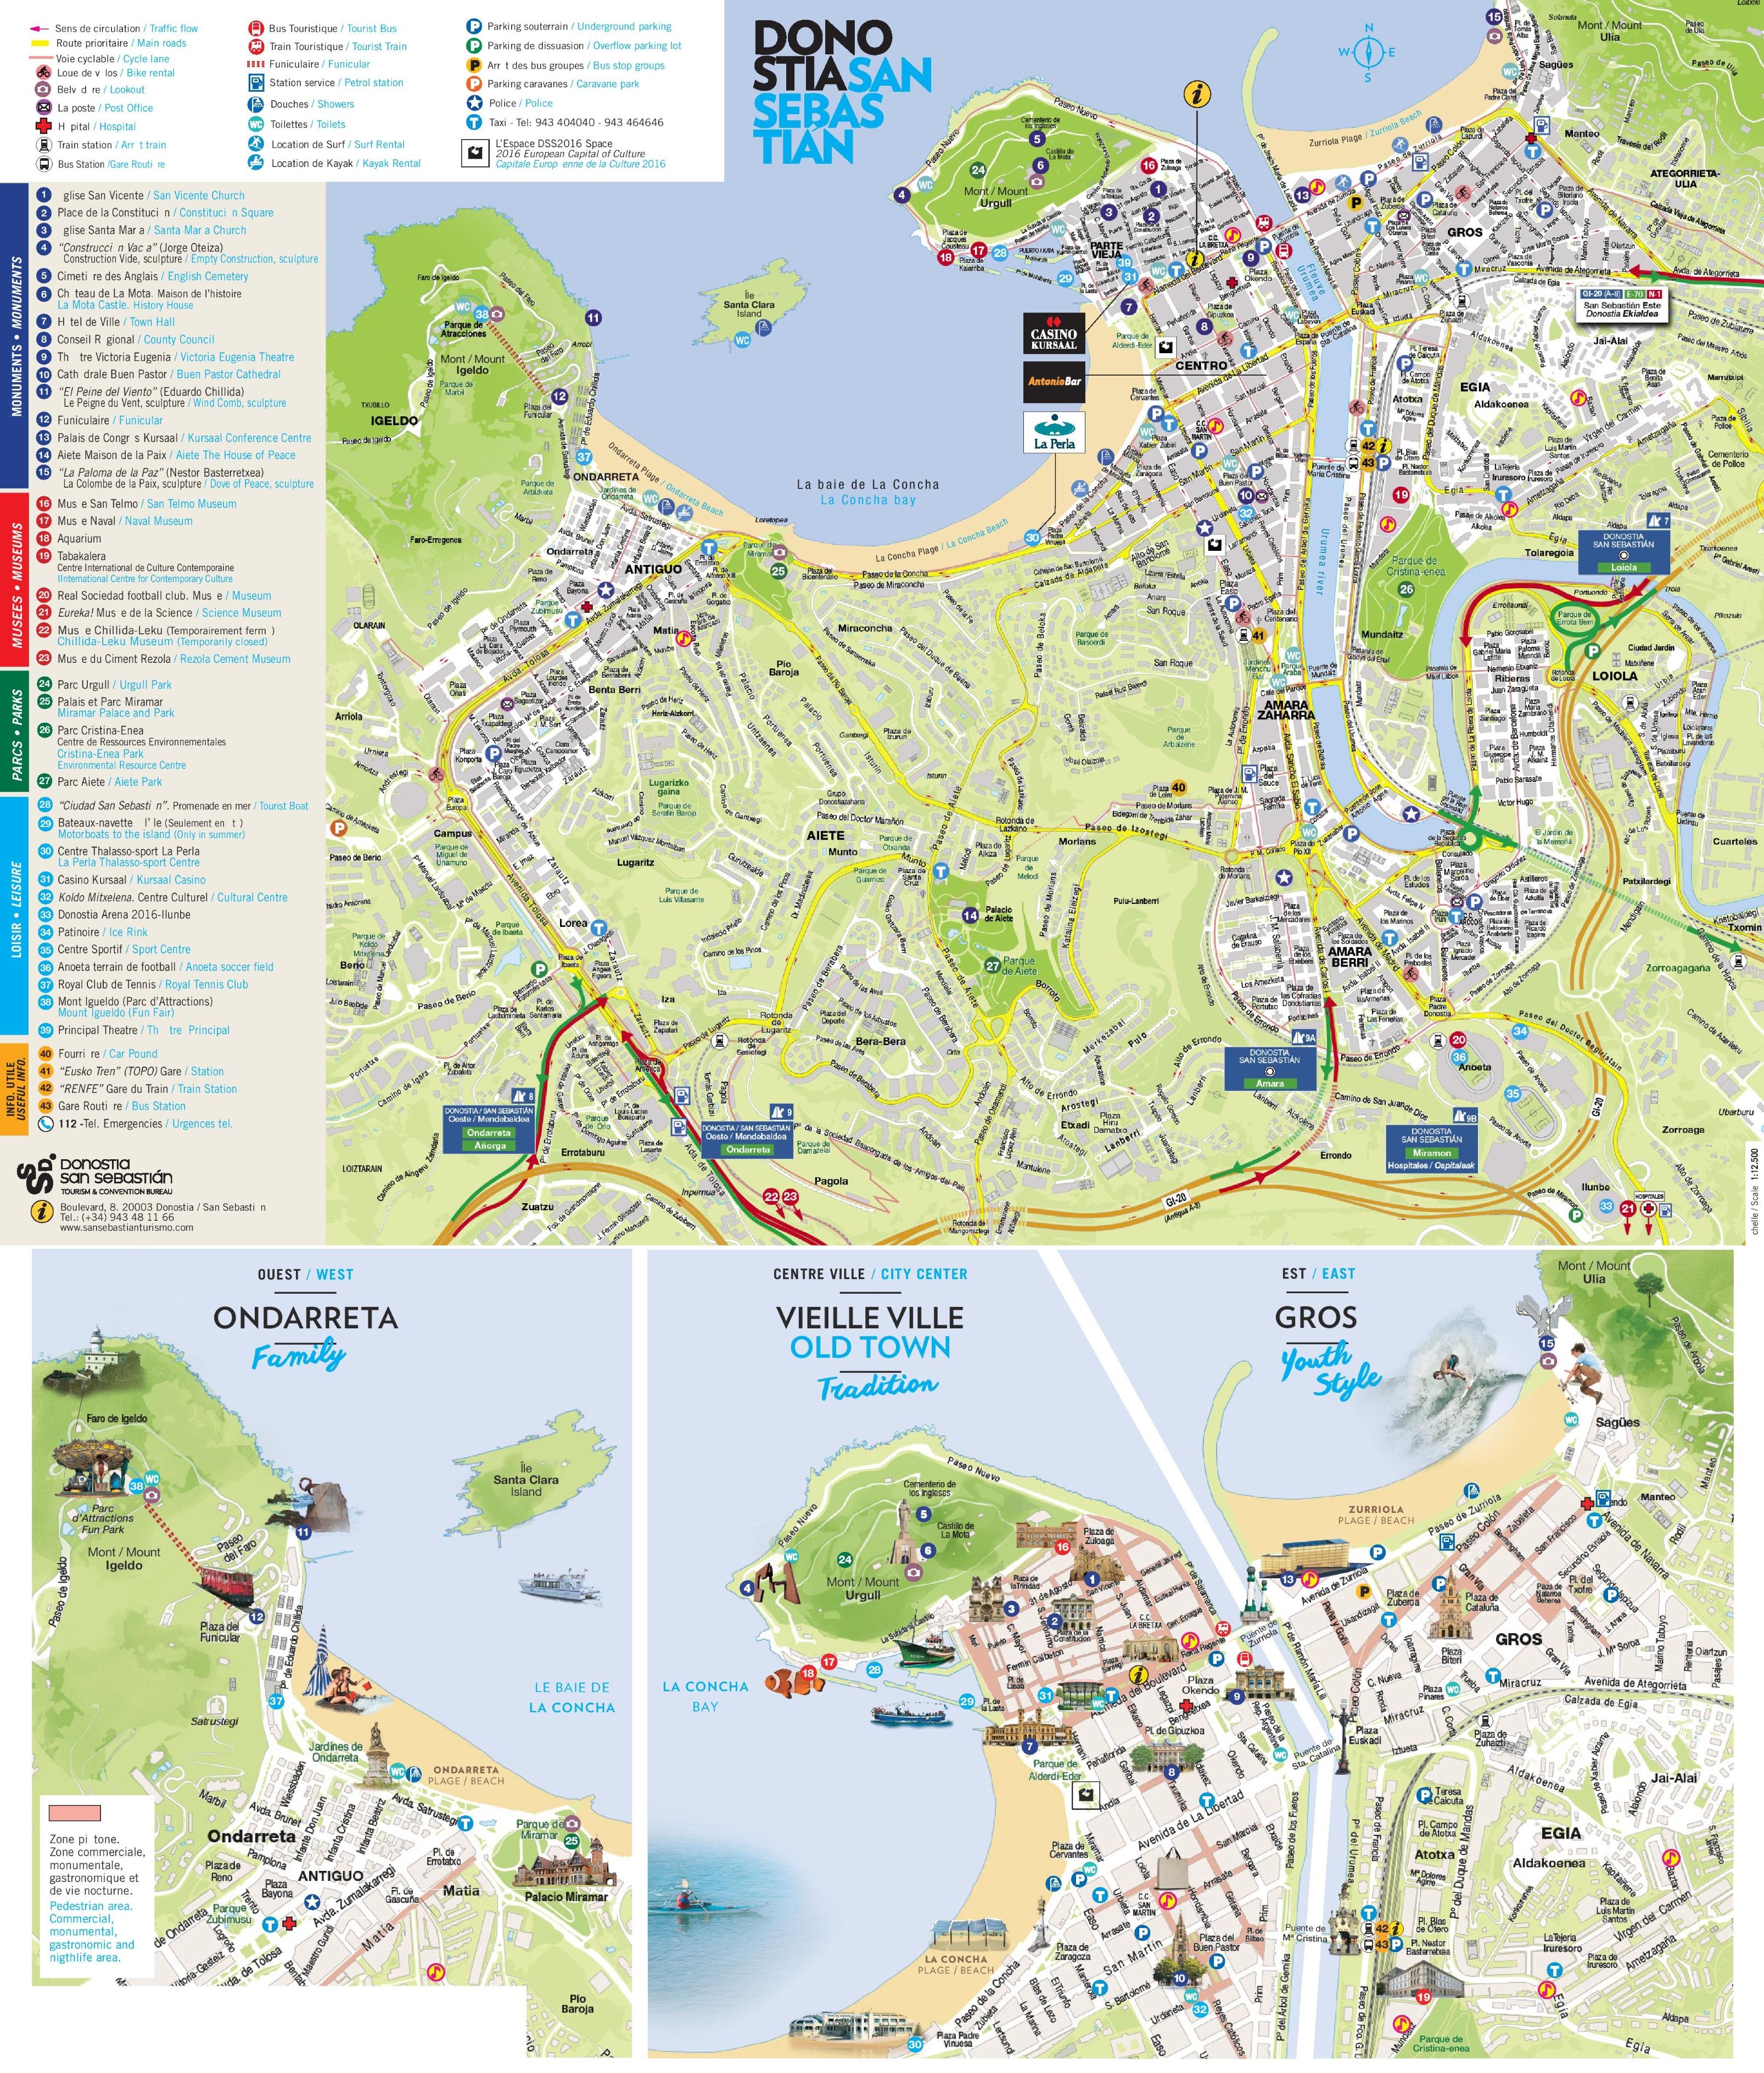 San Sebastian Spain Map San Sebastián Maps   Spain   Maps of San Sebastián (Donostia) San Sebastian Spain Map